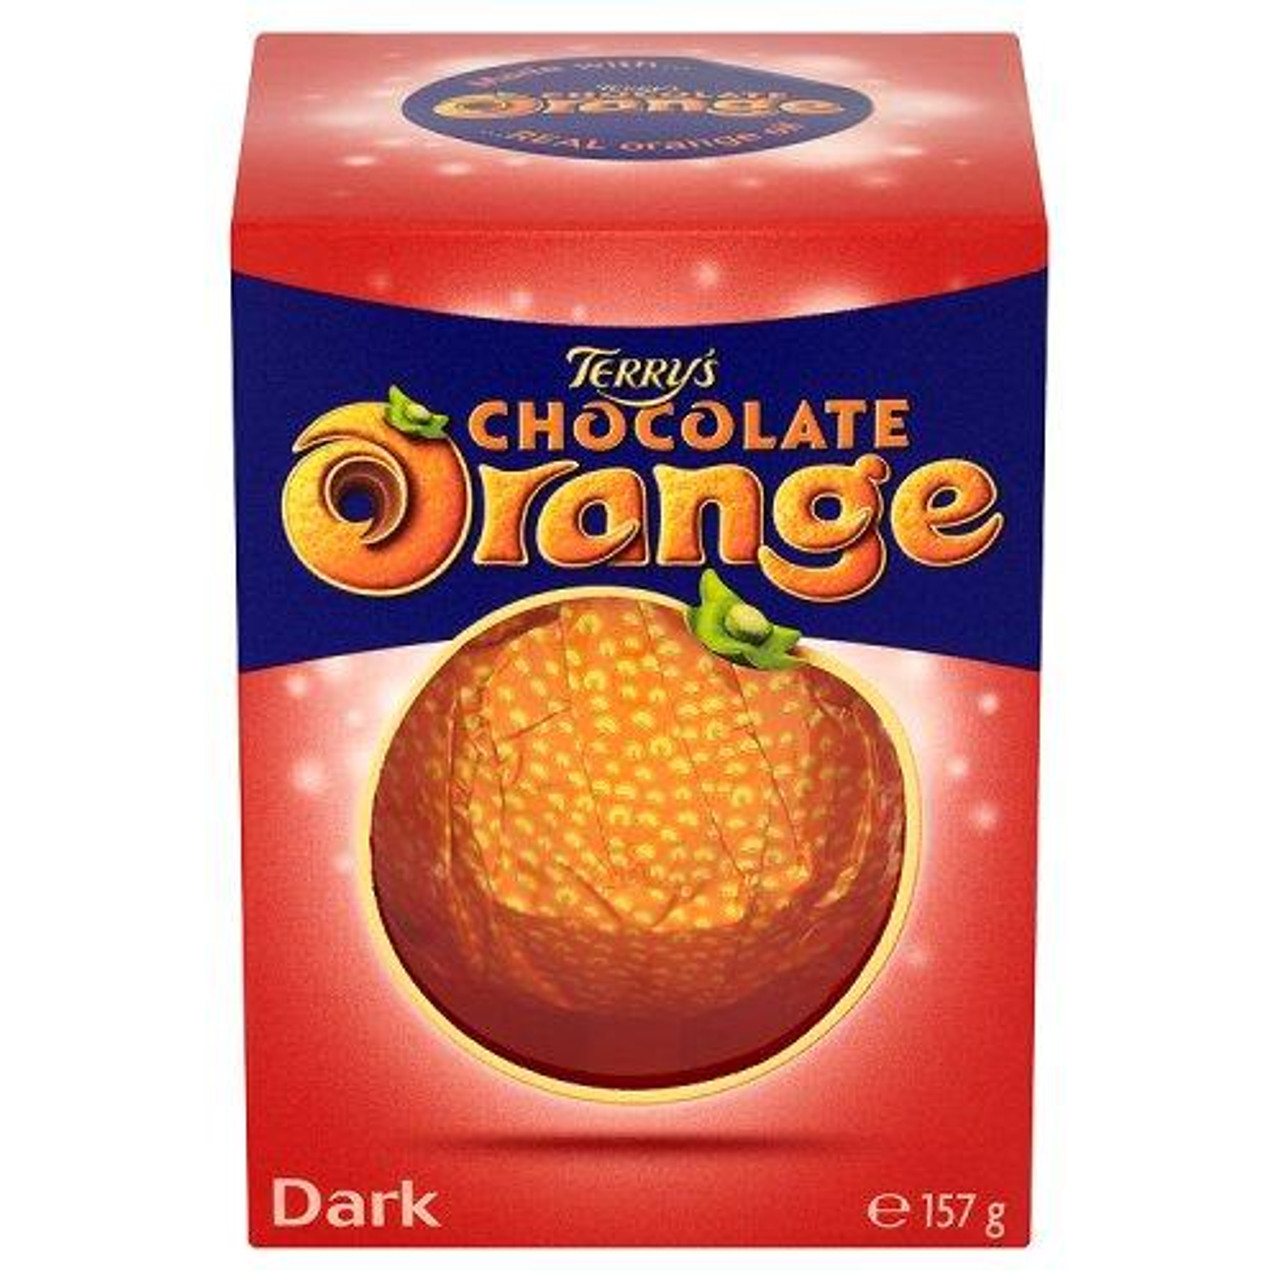 Terry's Chocolate Orange - Dark, 157g